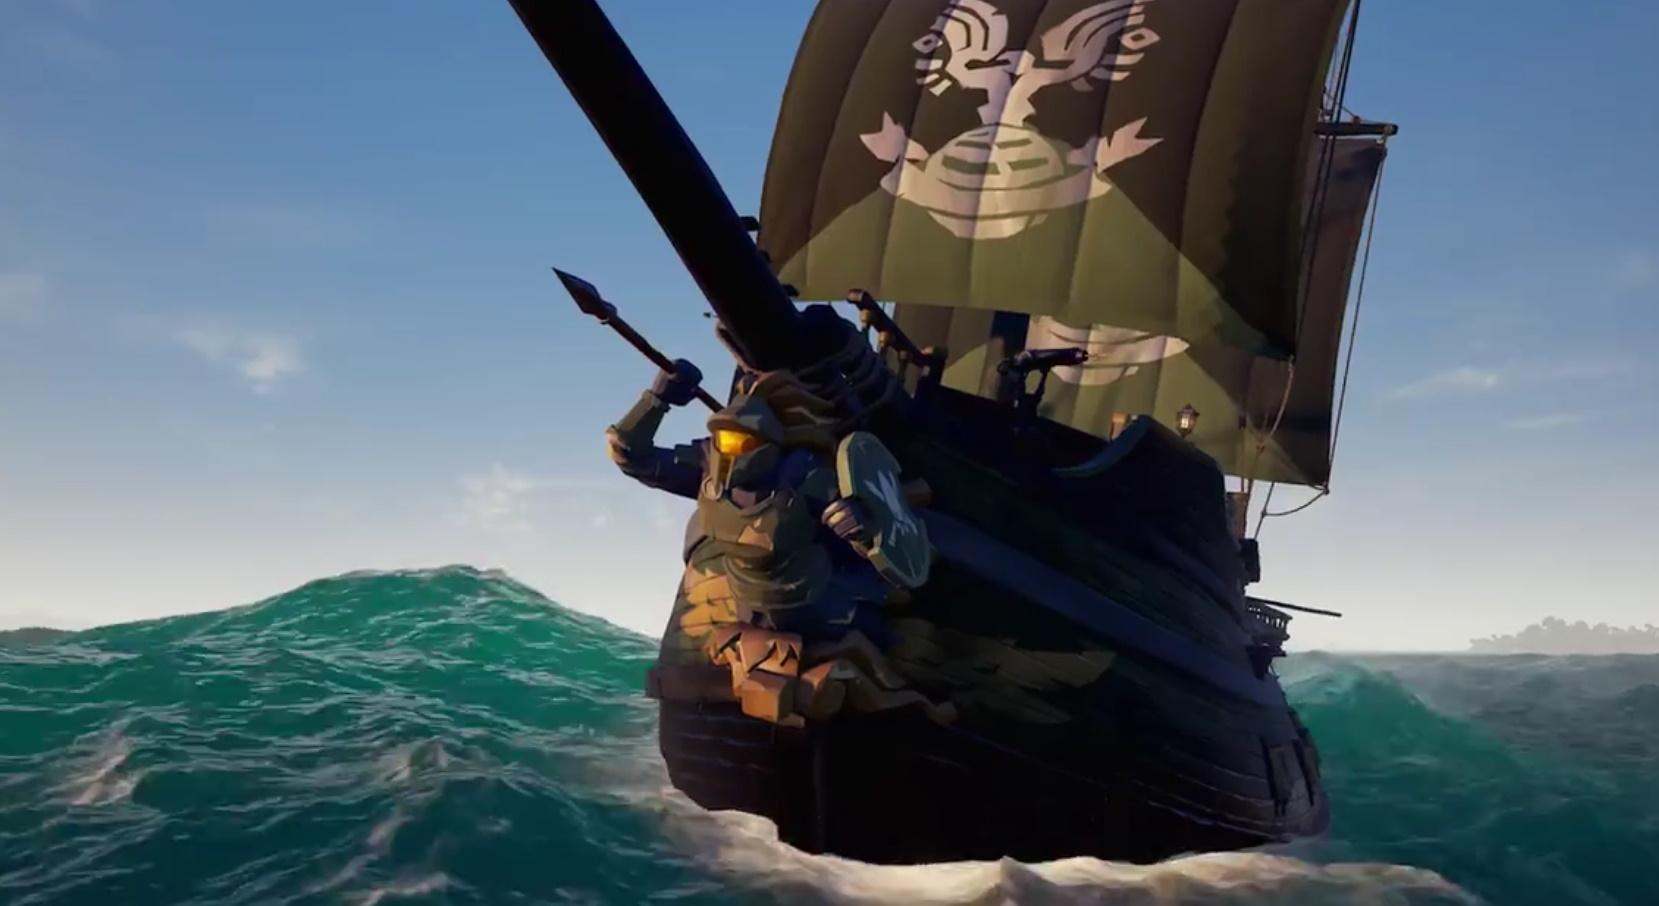 [Xbox One/Windows 10] Sea of Thieves Halo Inspired Spartan Ship - Free